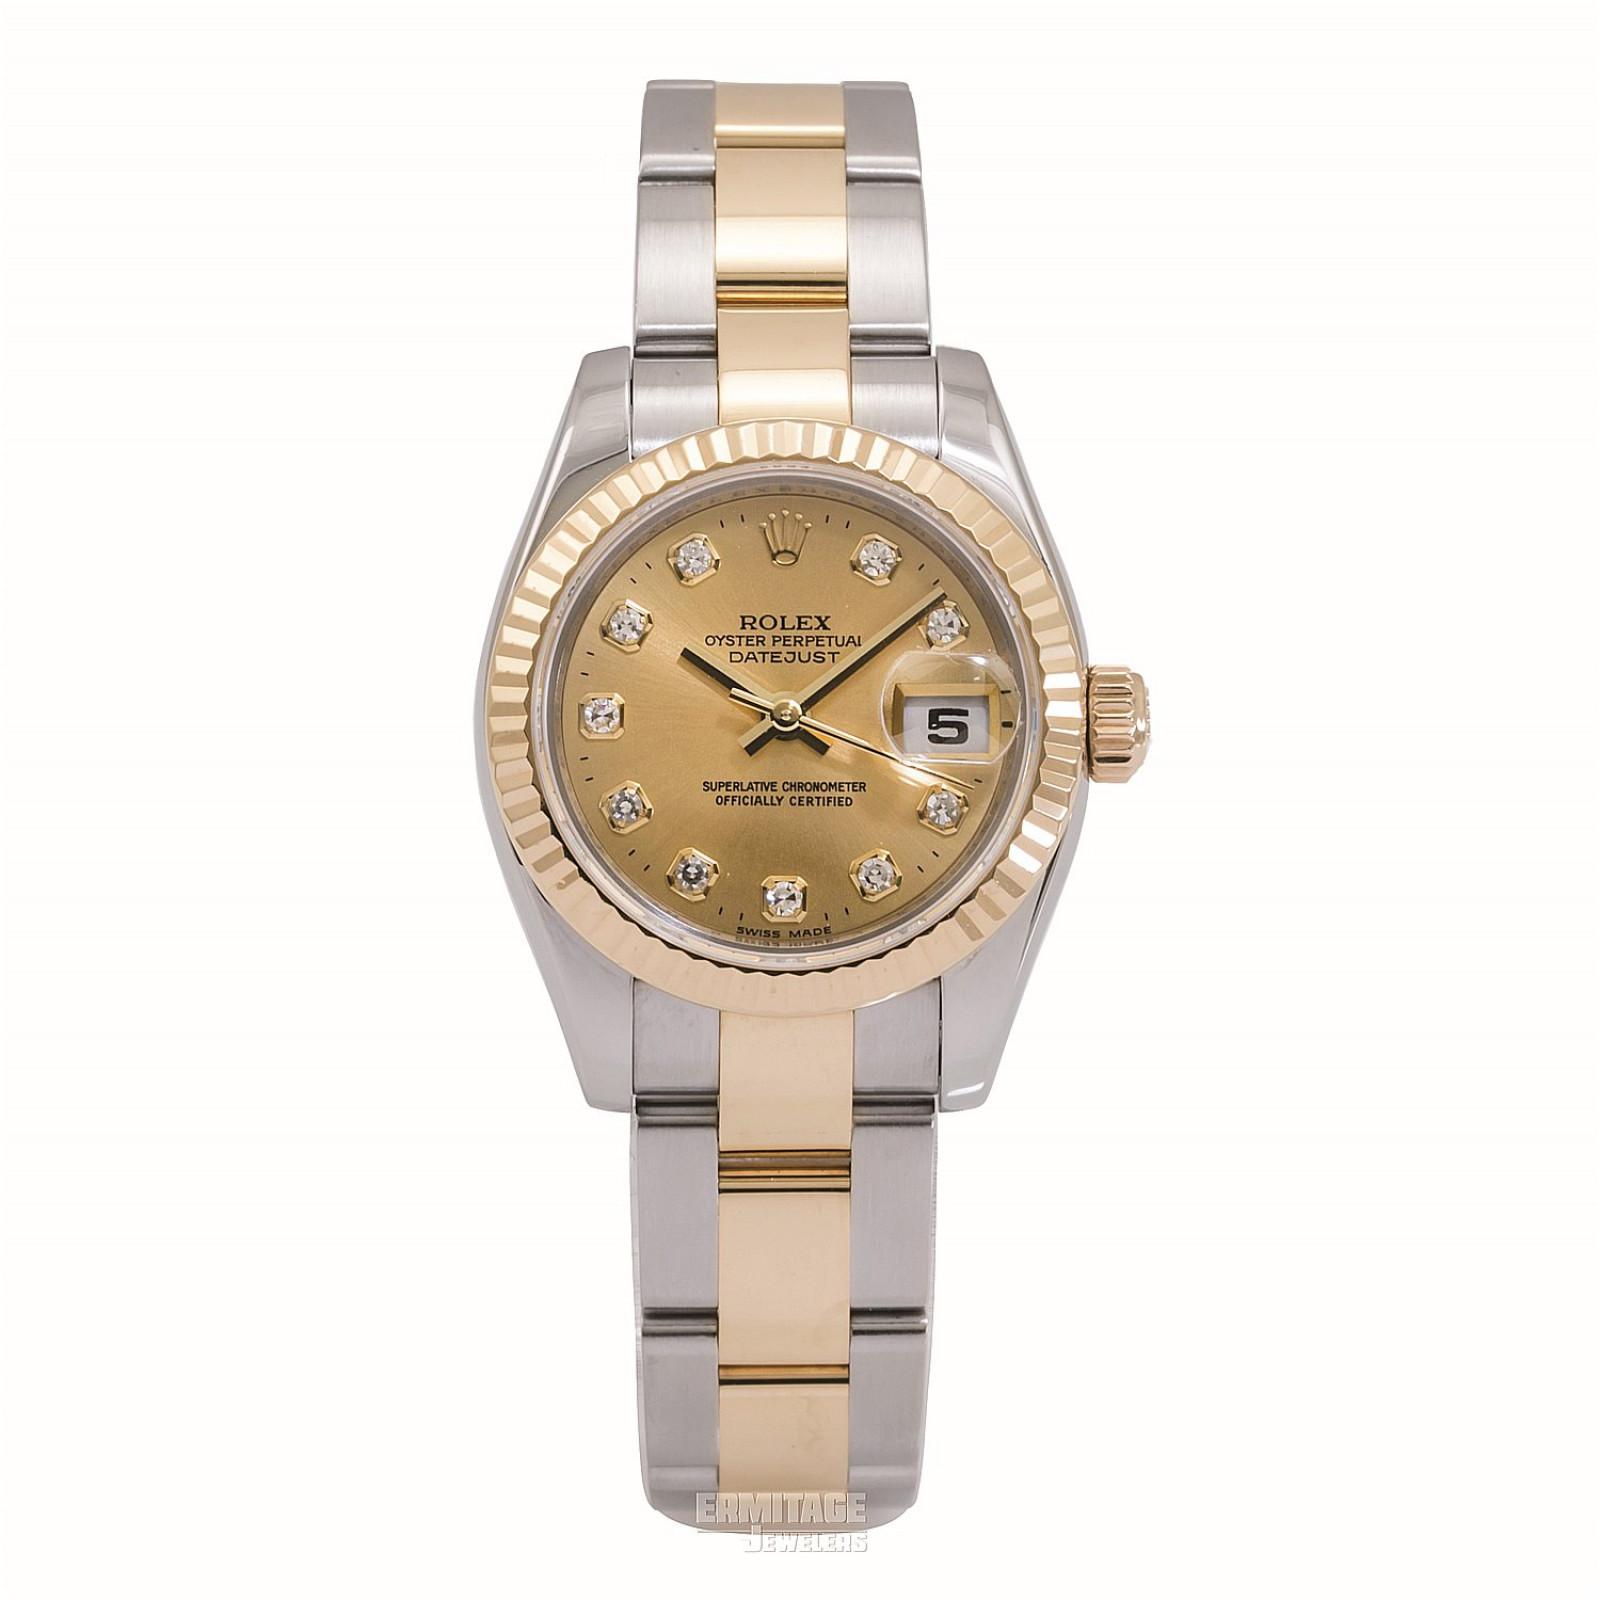 2009 Champagne Rolex Datejust Ref. 179173